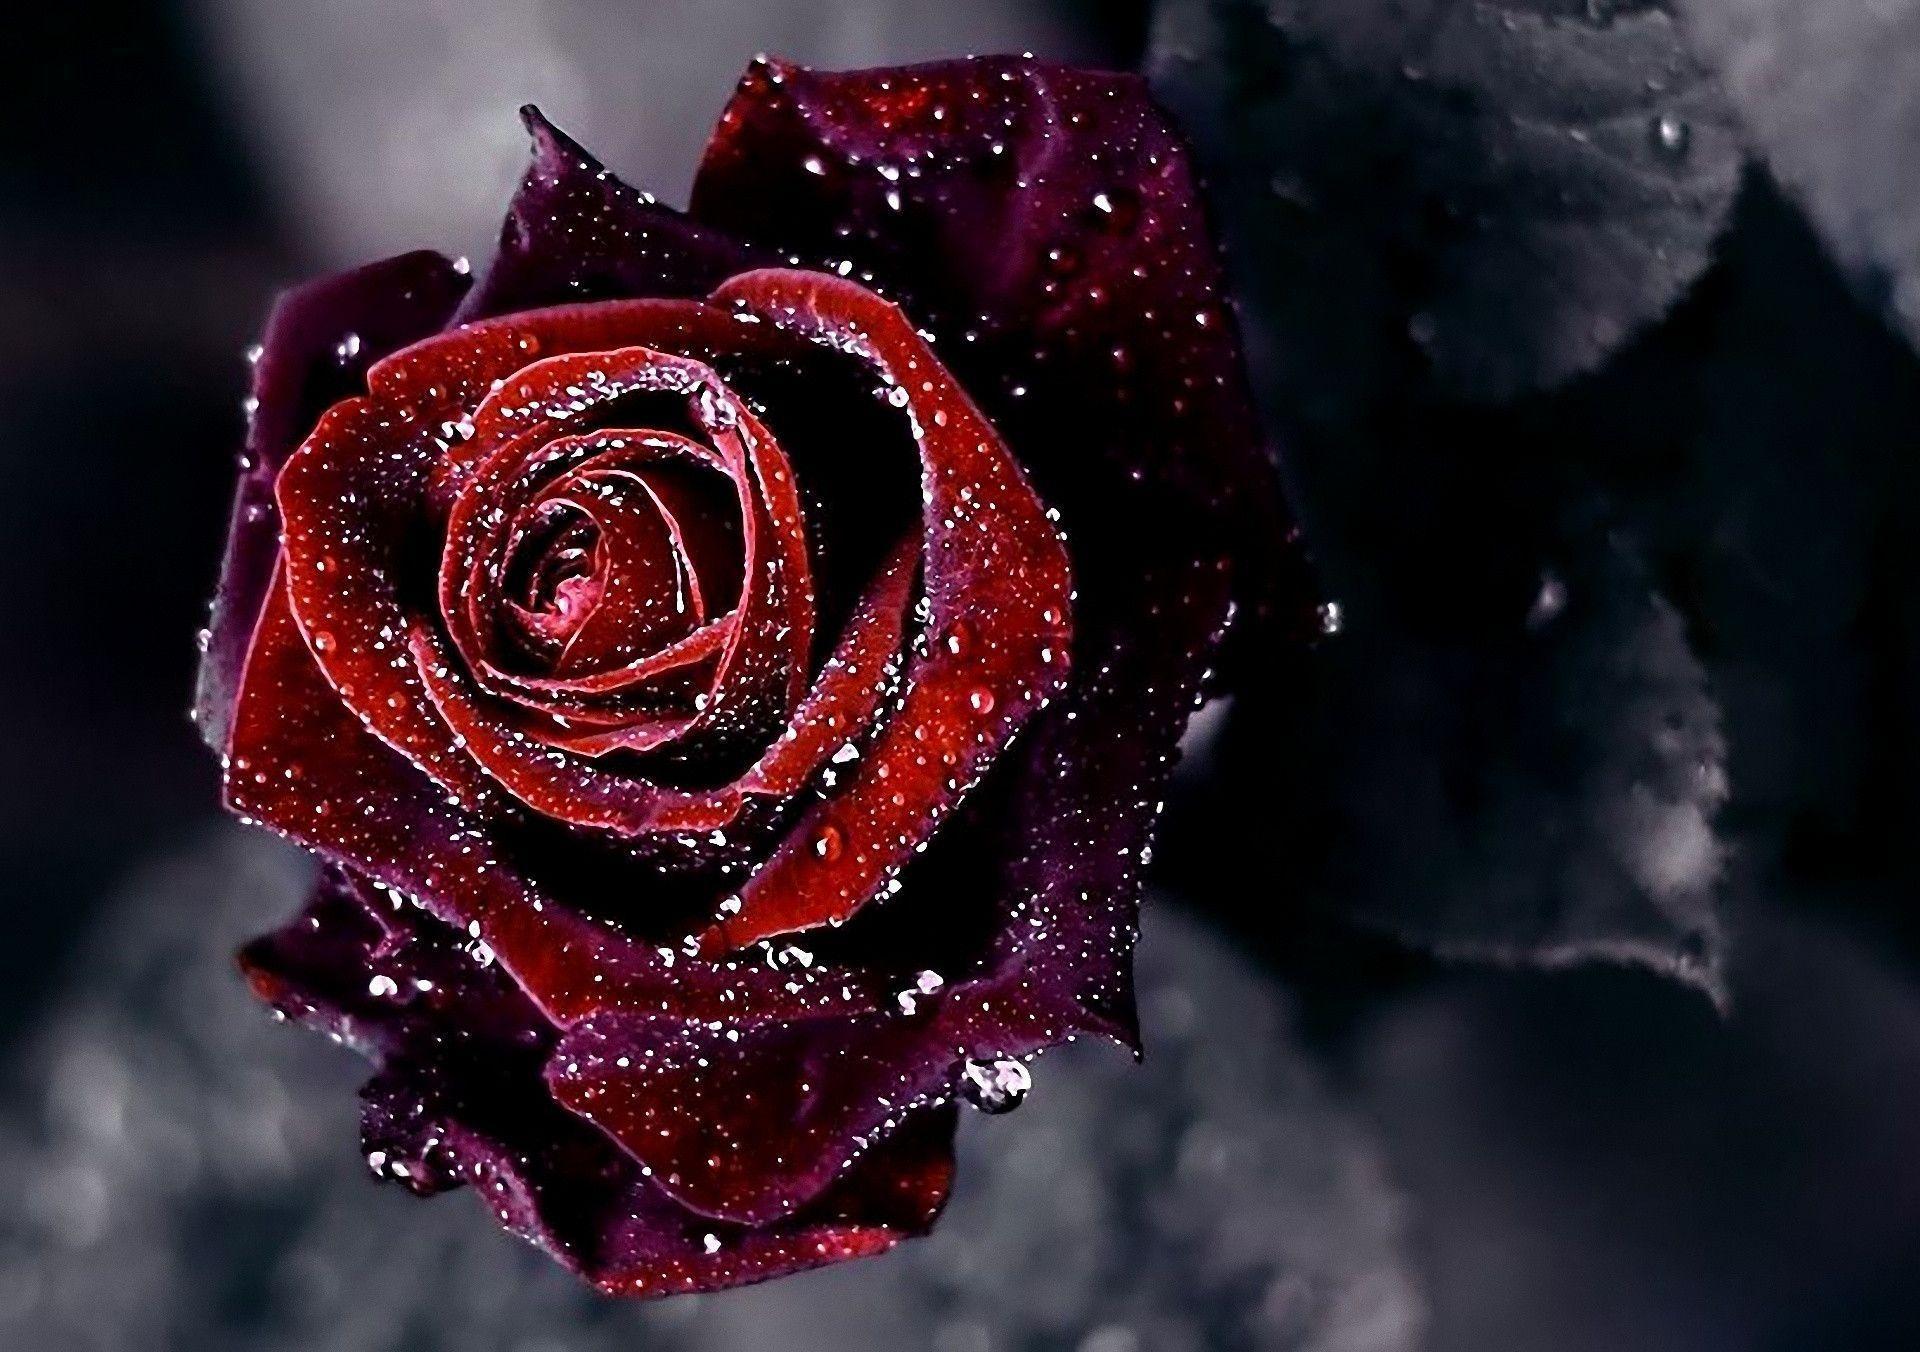 Rose Wallpapers HD - Wallpaper Cave